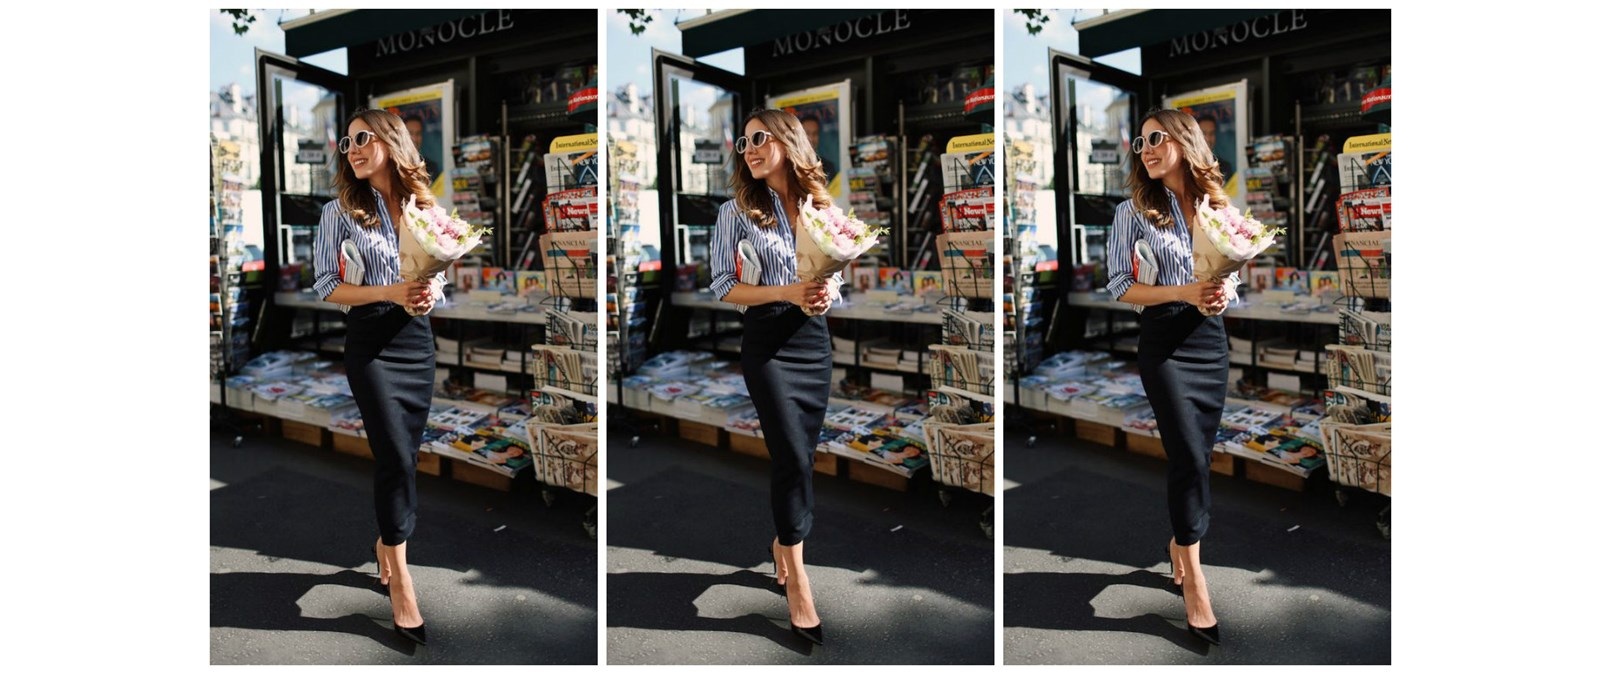 9328788a2b Γαλλικό στυλ  Τα 8 μυστικά για να ντύνεσαι σαν να ζεις στο Παρίσι